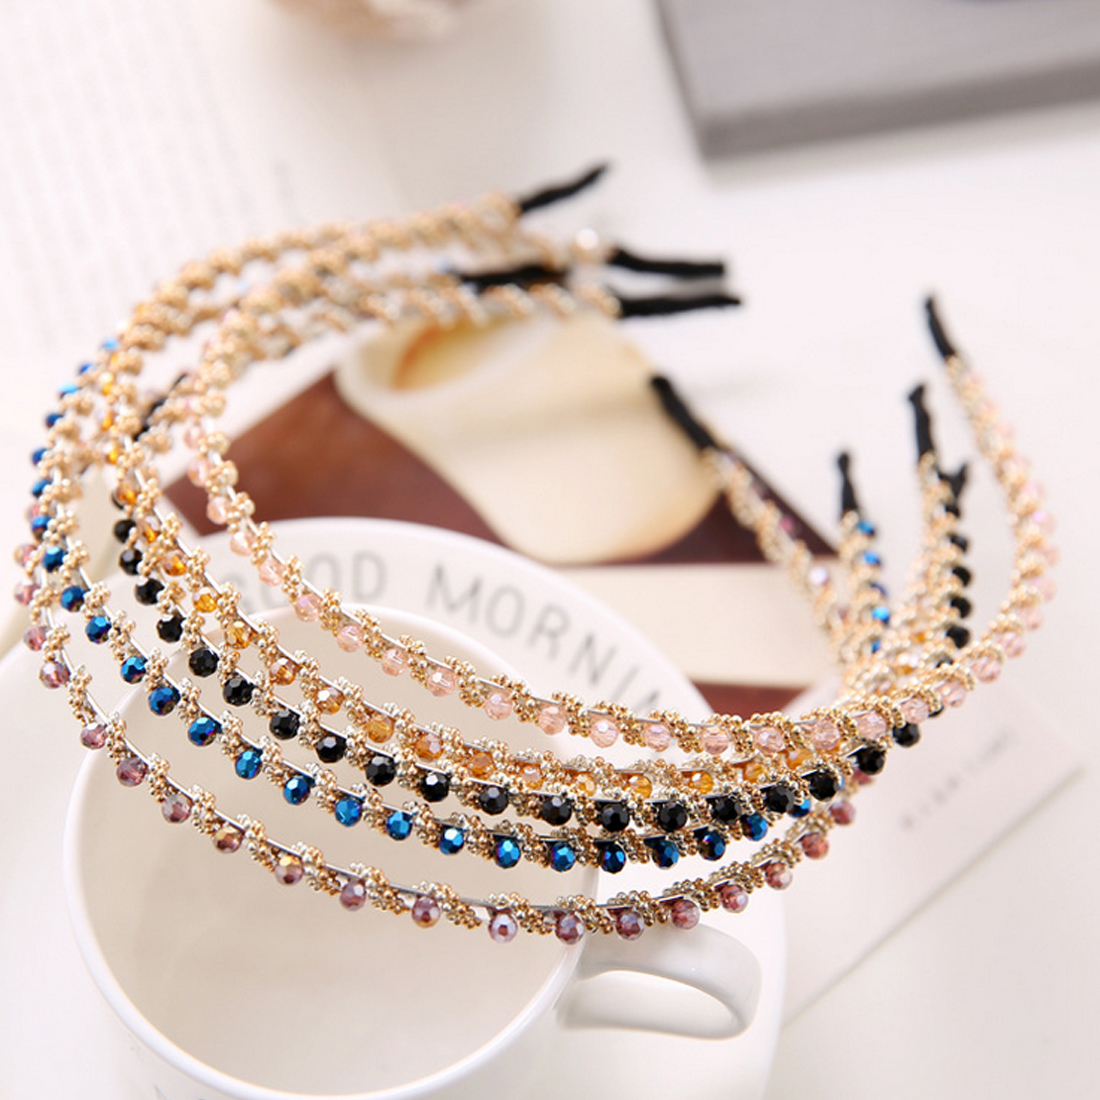 Fashion Crystal Rhinestone Hairband Headband Head Piece Hair Braider Styling Tools Accessories for Women Lady Girl